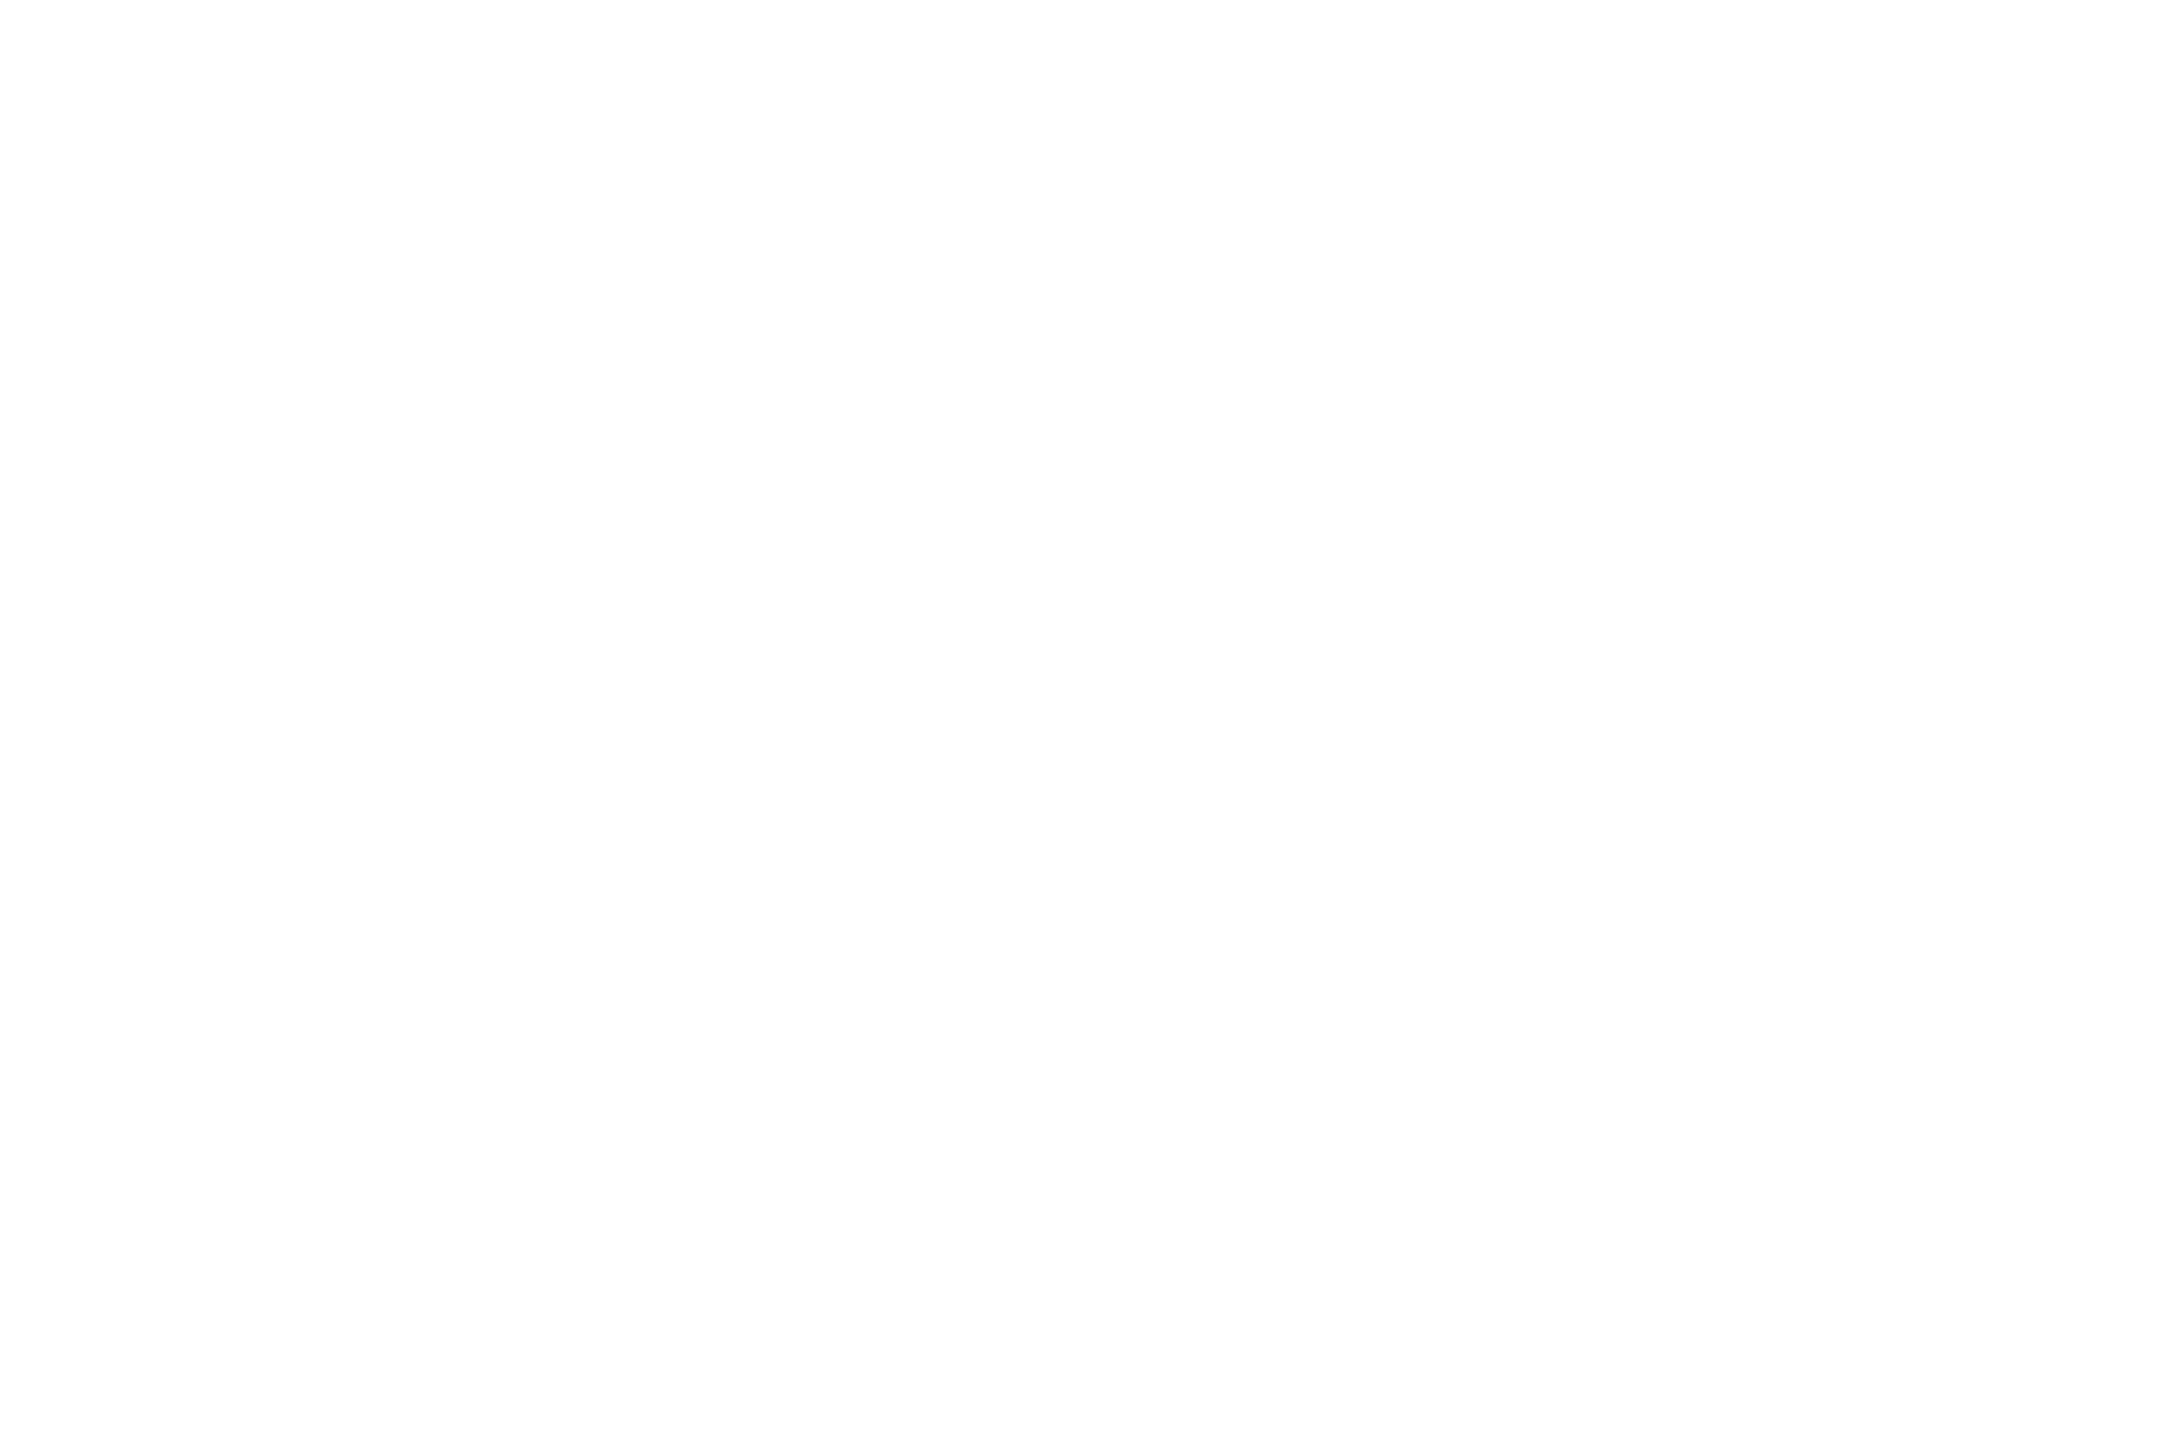 mg_2374